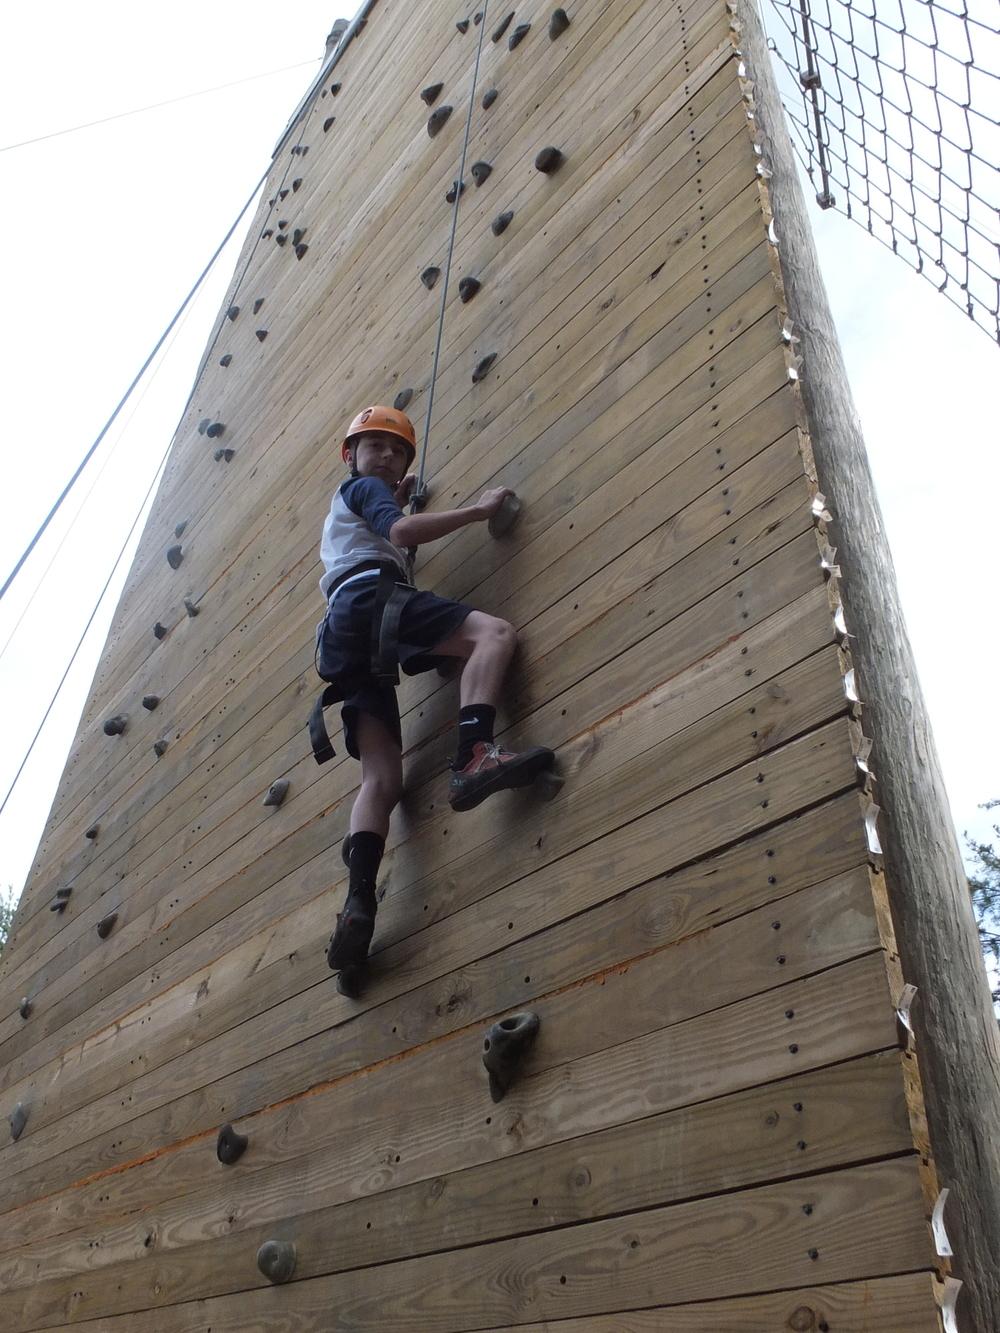 50' Climbing Wall